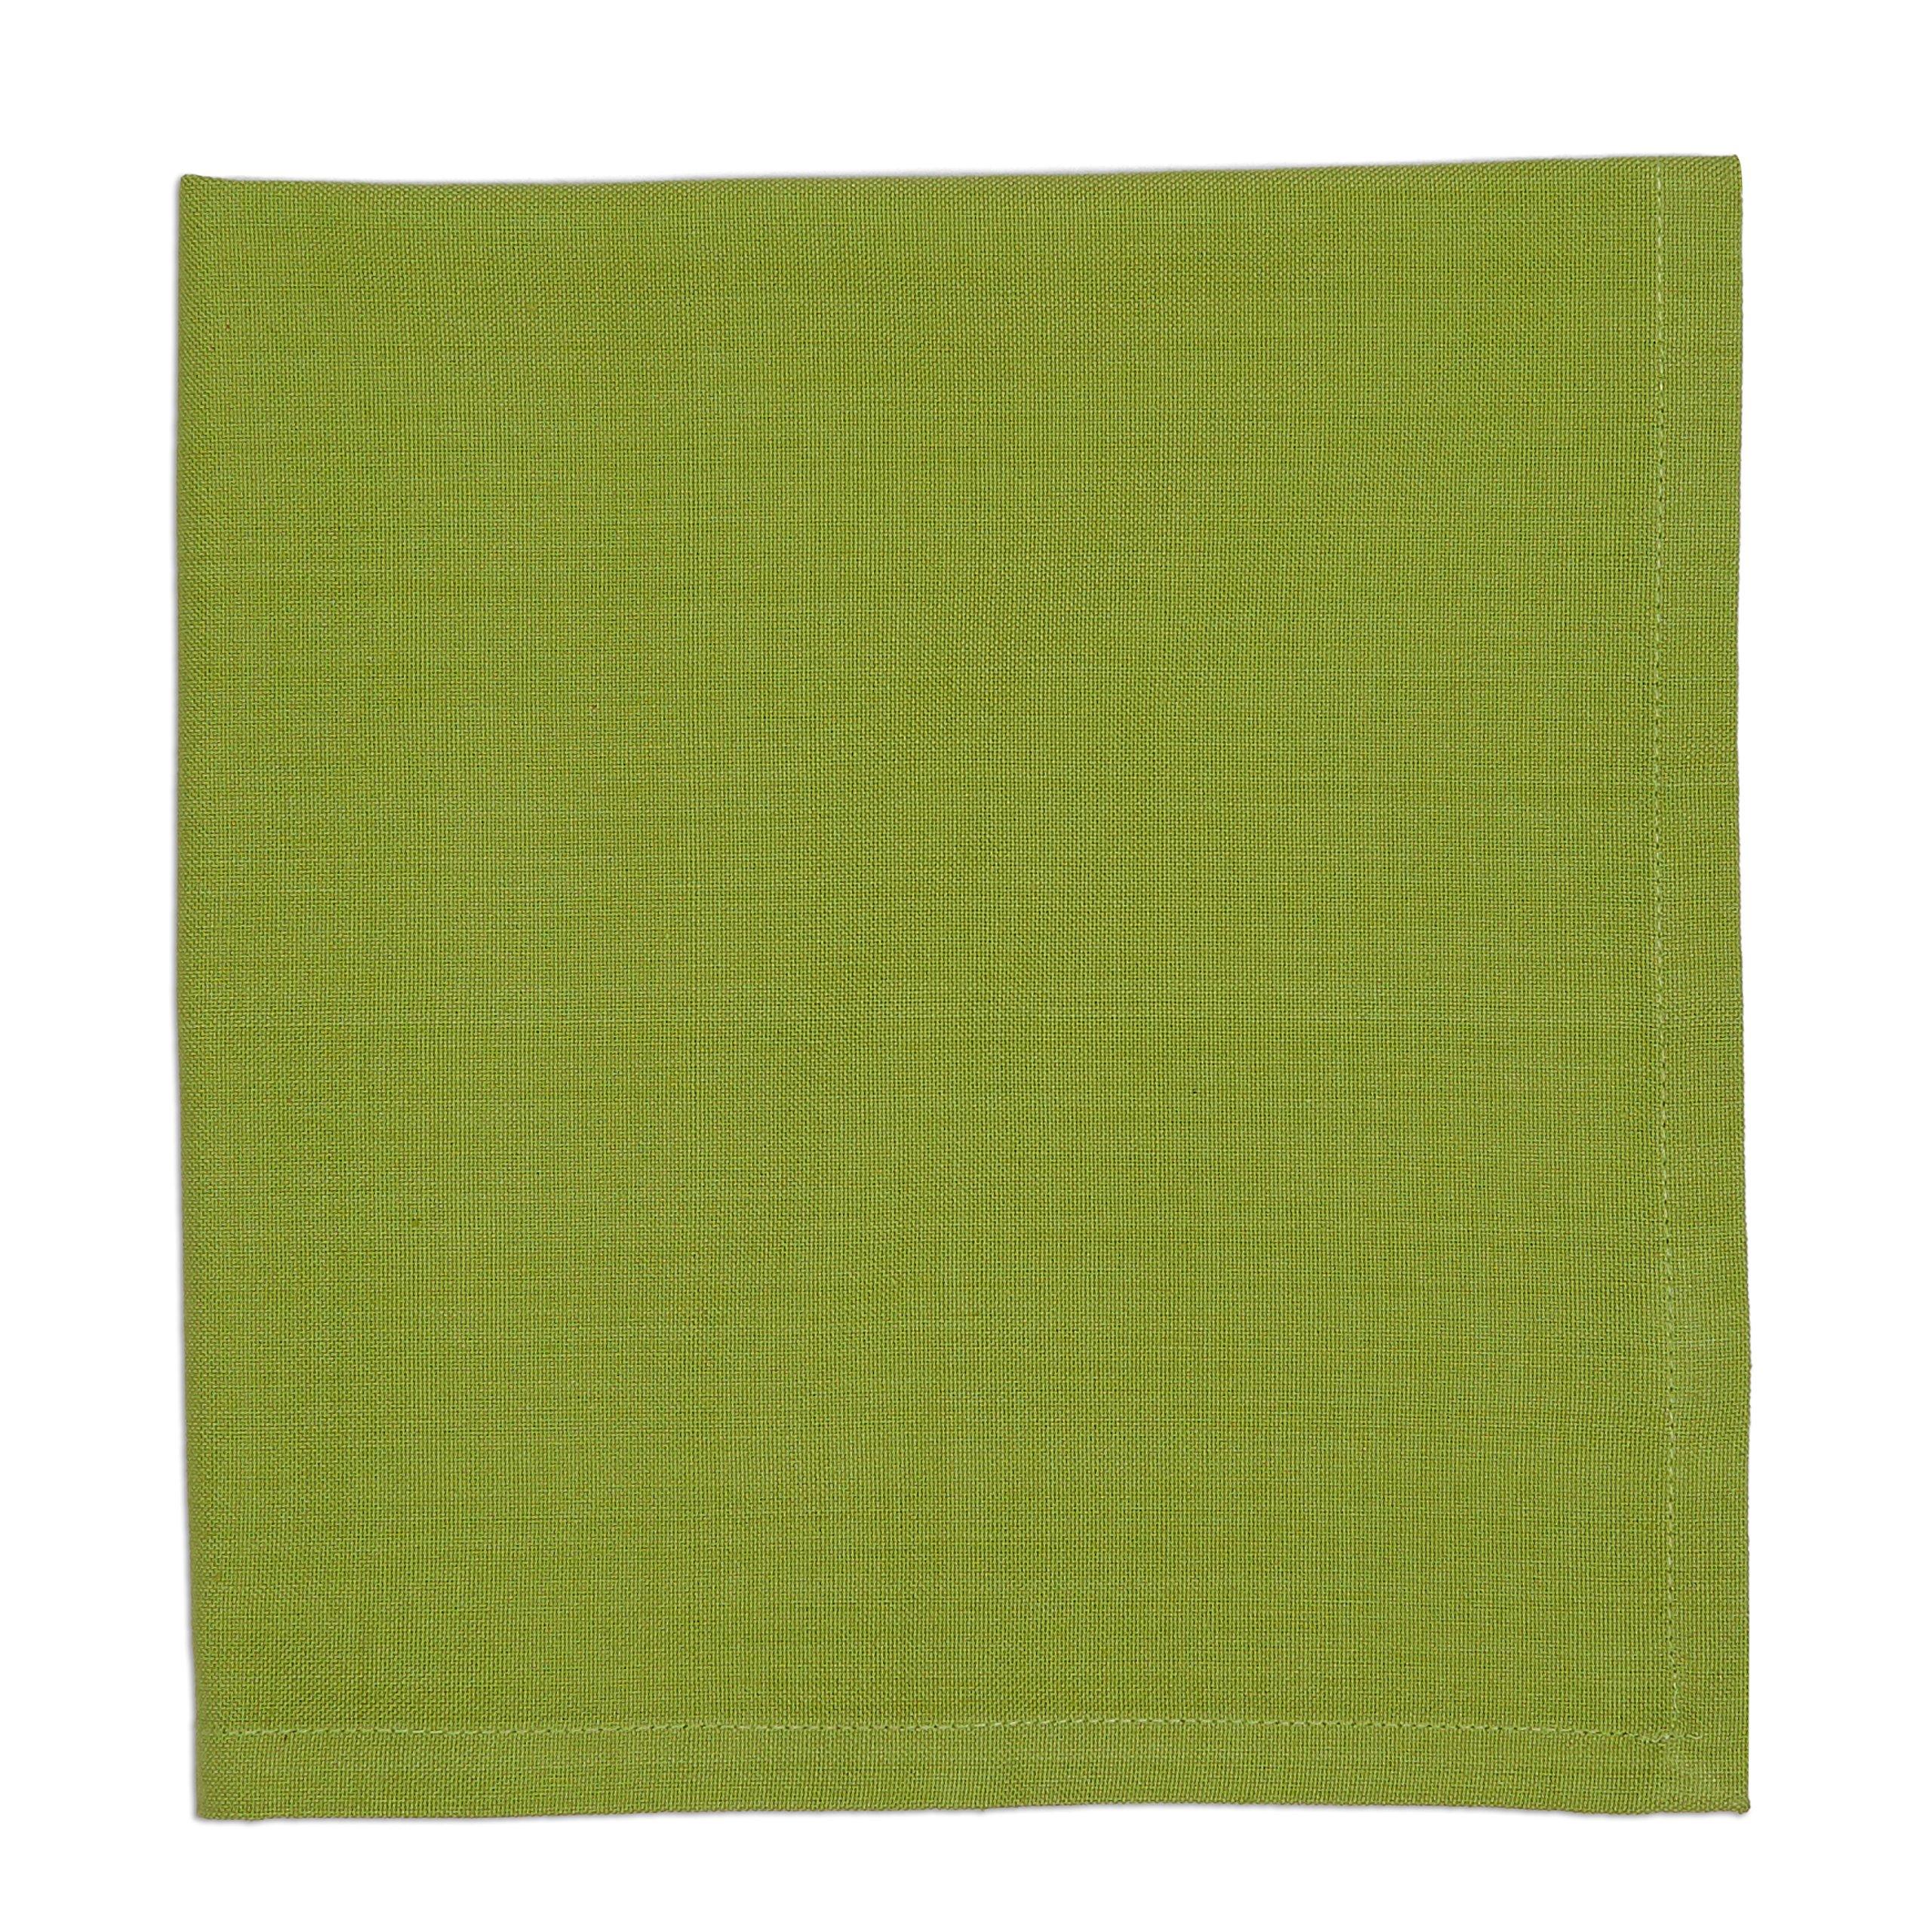 DII 100% Cotton, Oversized Basic Everyday 20x20 Napkin Set of 6, Pistachio by DII